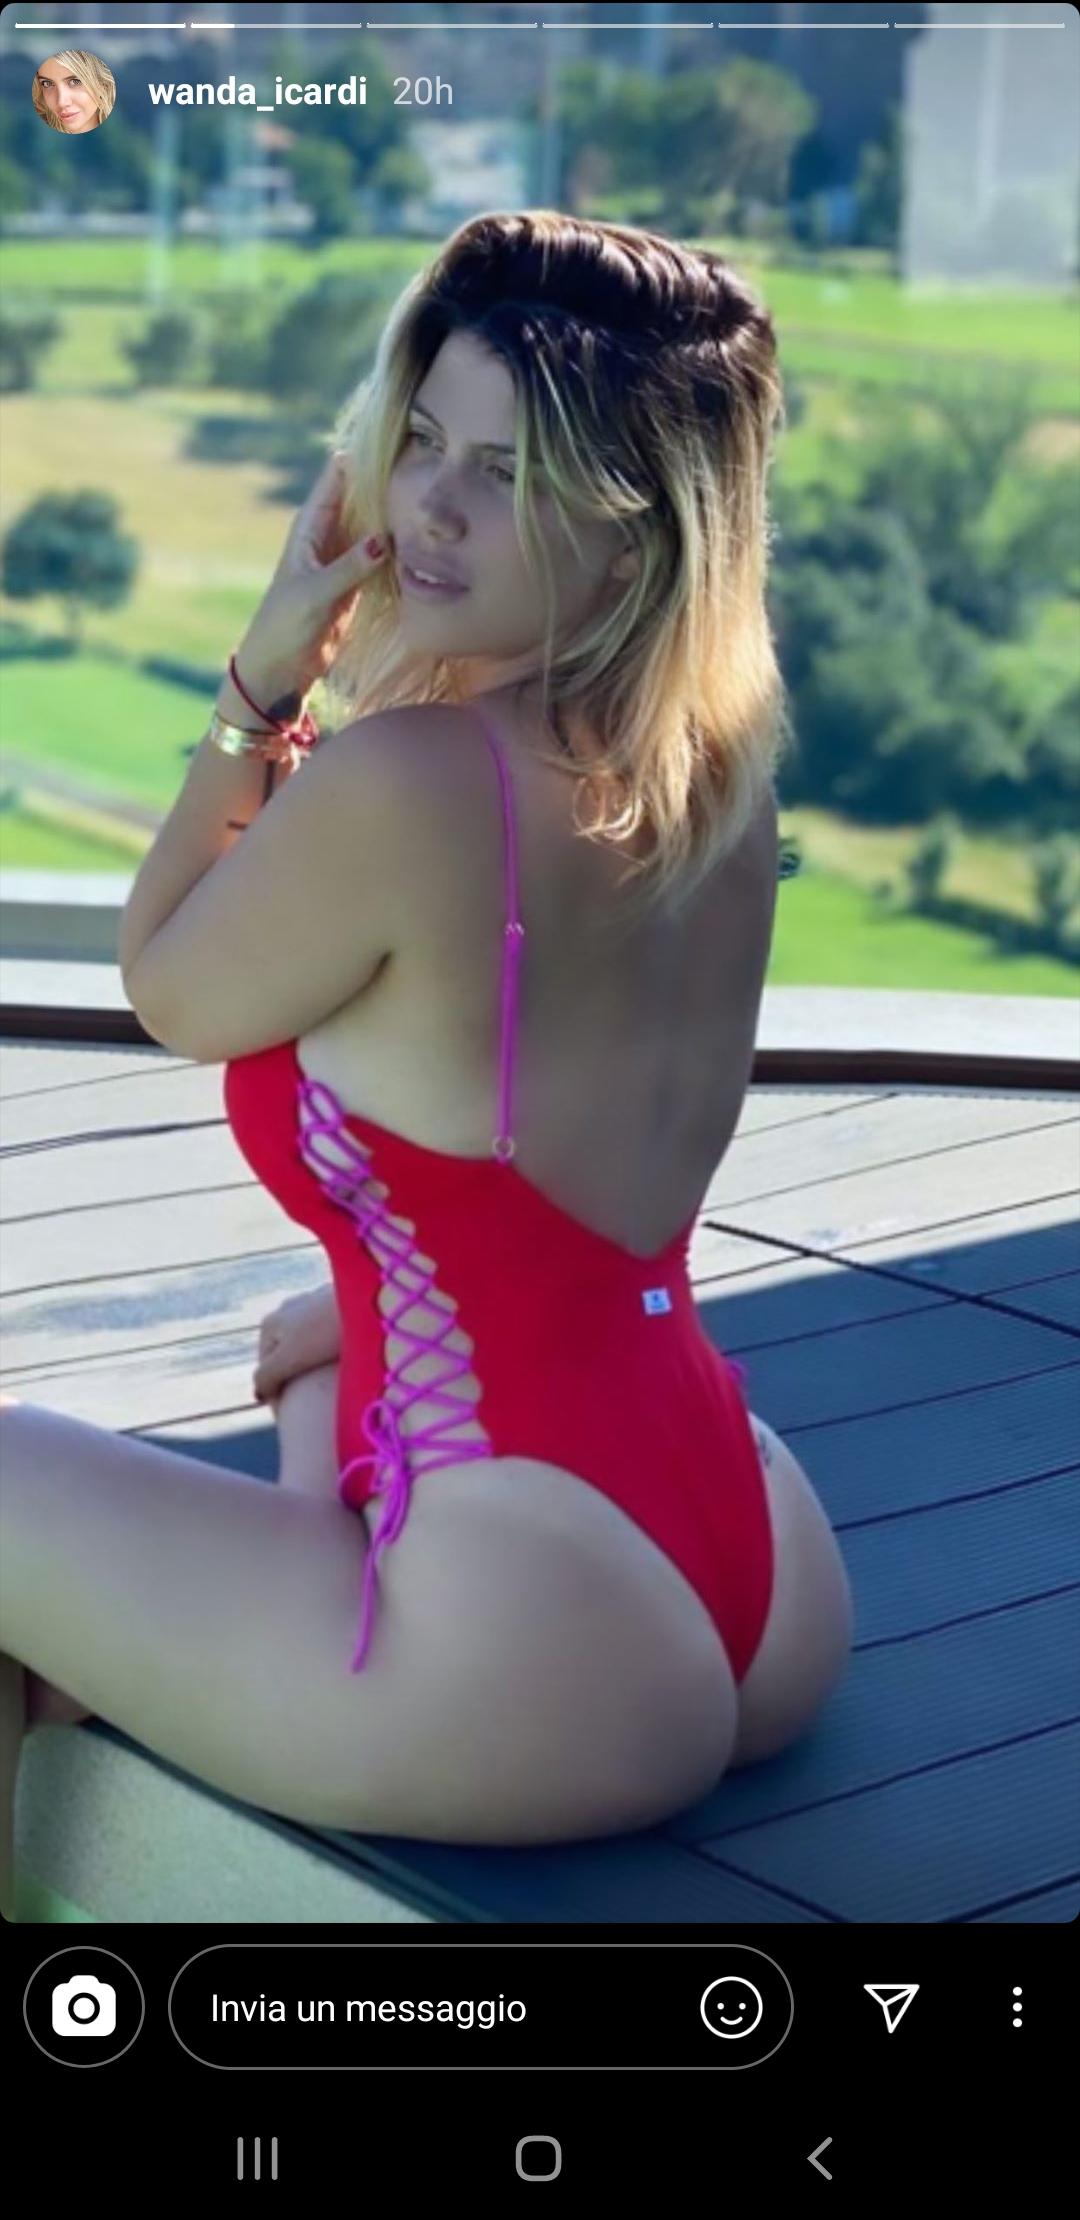 Wanda Nara Instagram: lato B da censura